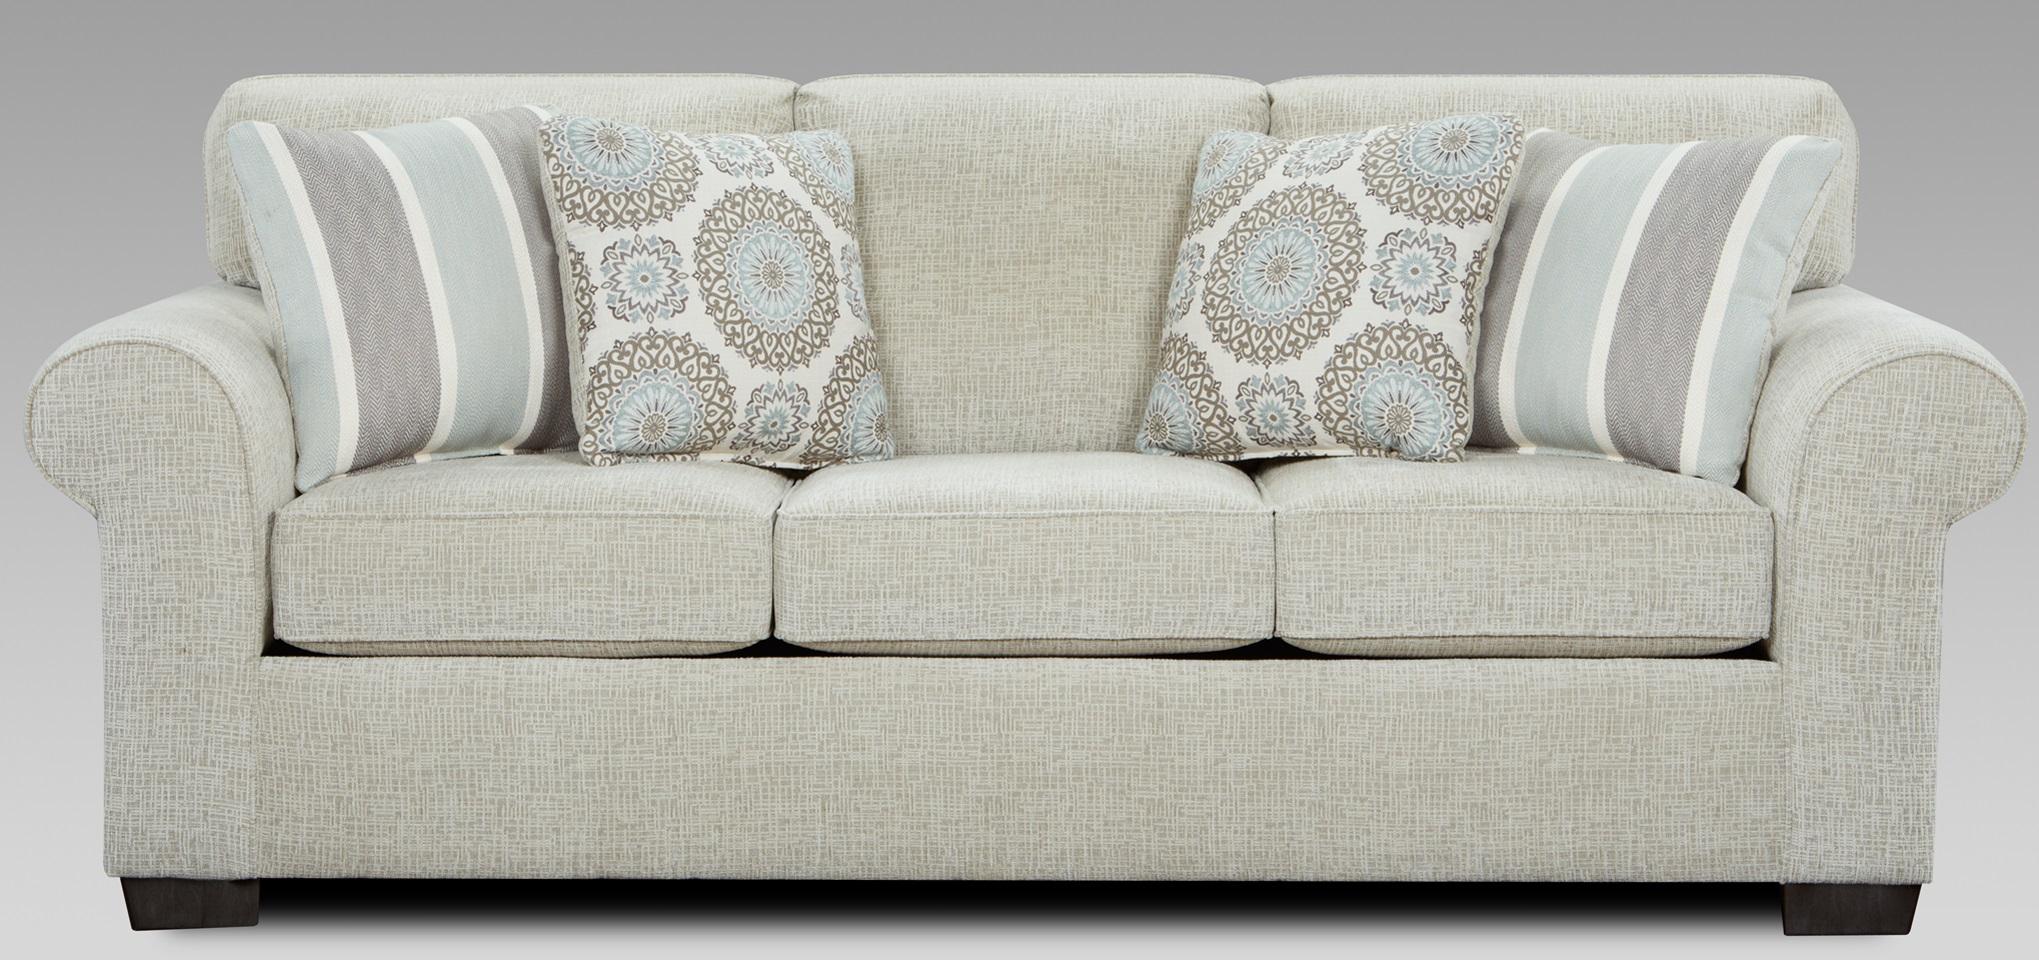 outlet store 7461d 0fddd Affordable Furniture Charisma Linen Queen Sleeper Sofa-3444